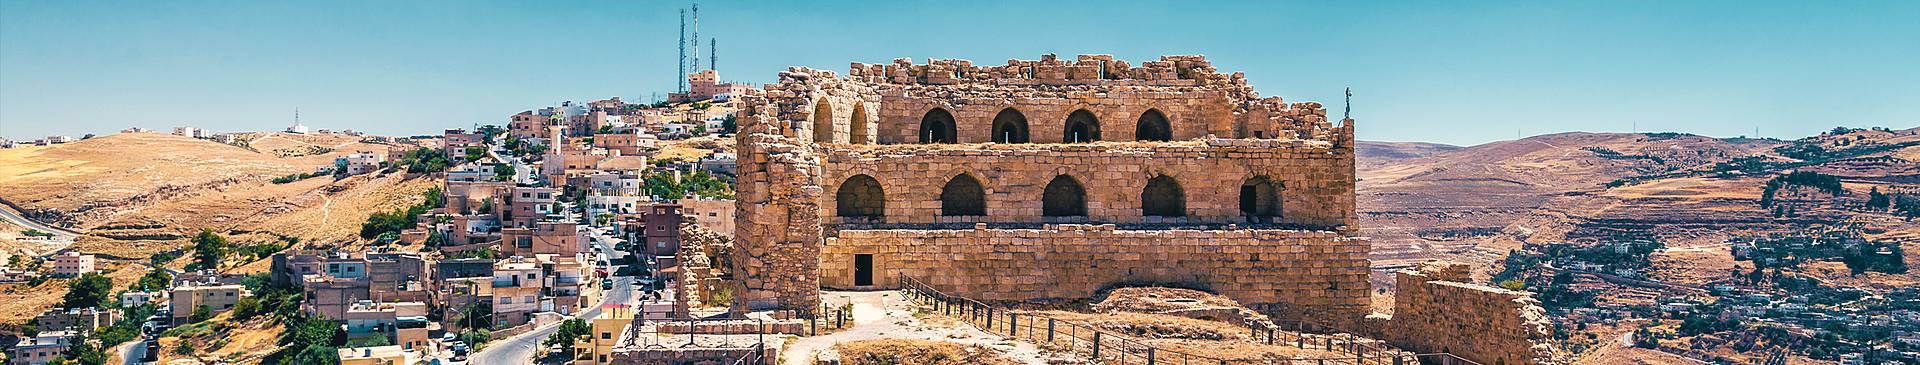 Viaggi in Giordania in estate